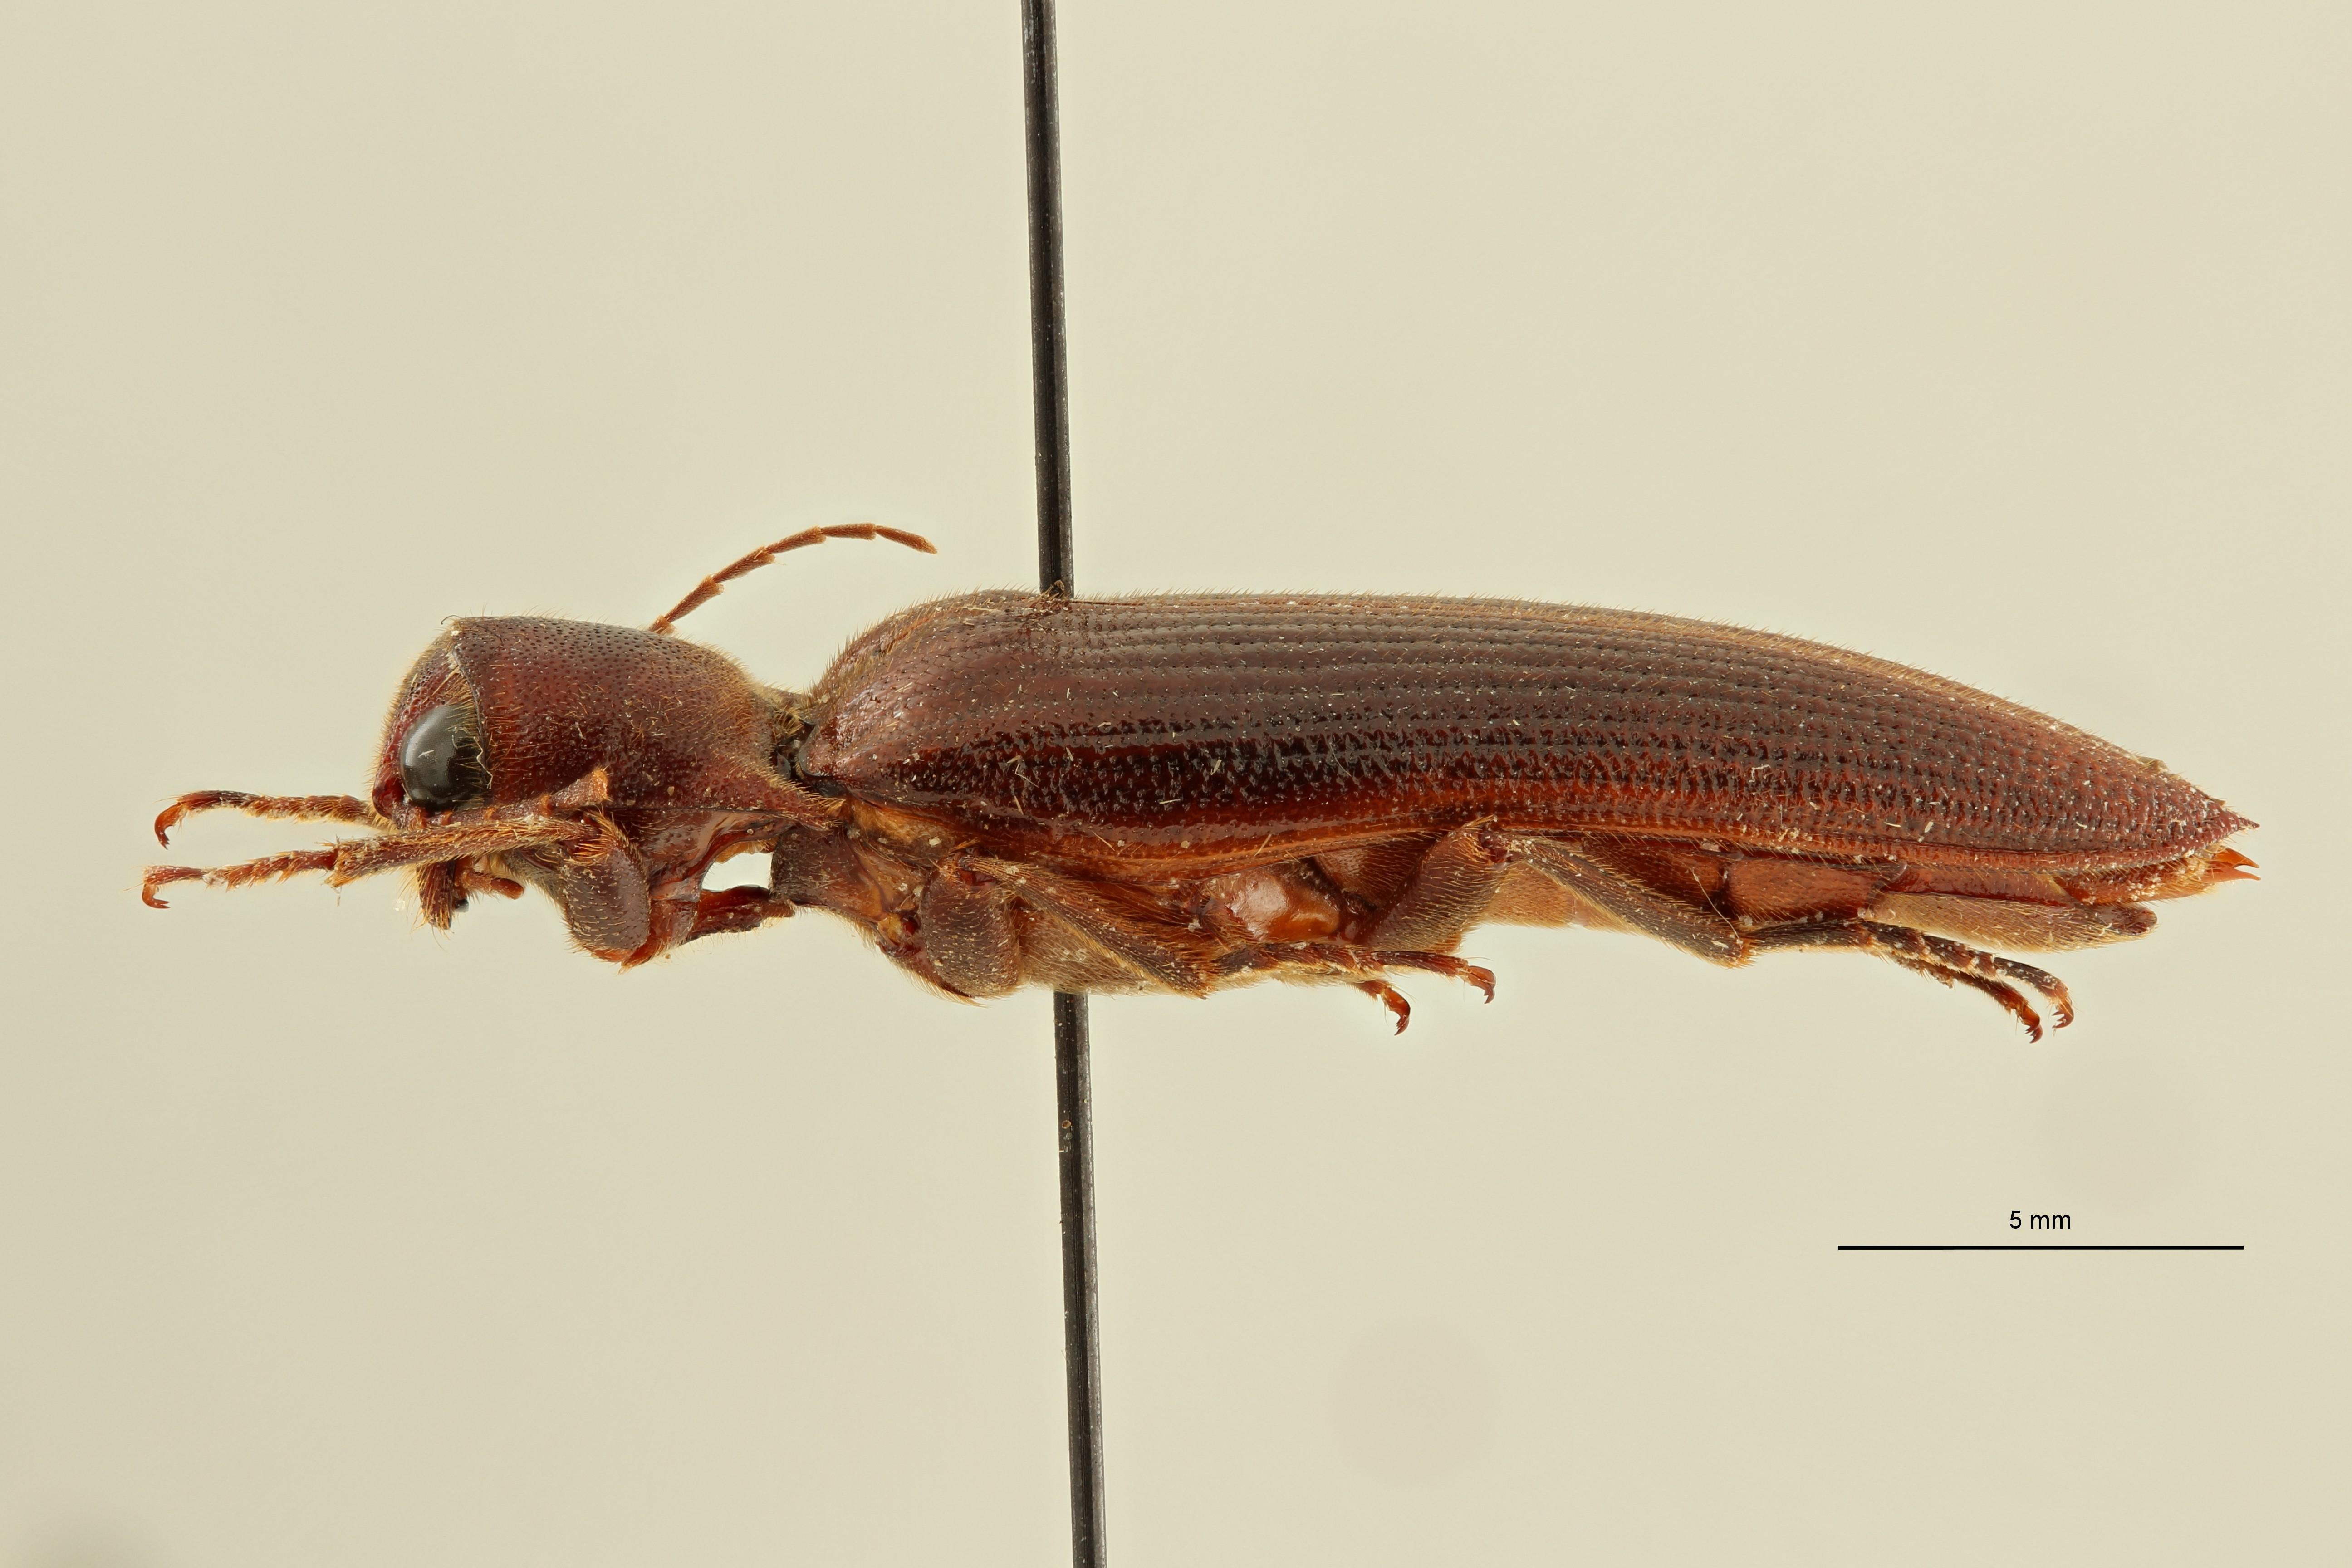 Eudicronychus distinctus var. fuscatus pt5 L ZS PMax Scaled.jpeg